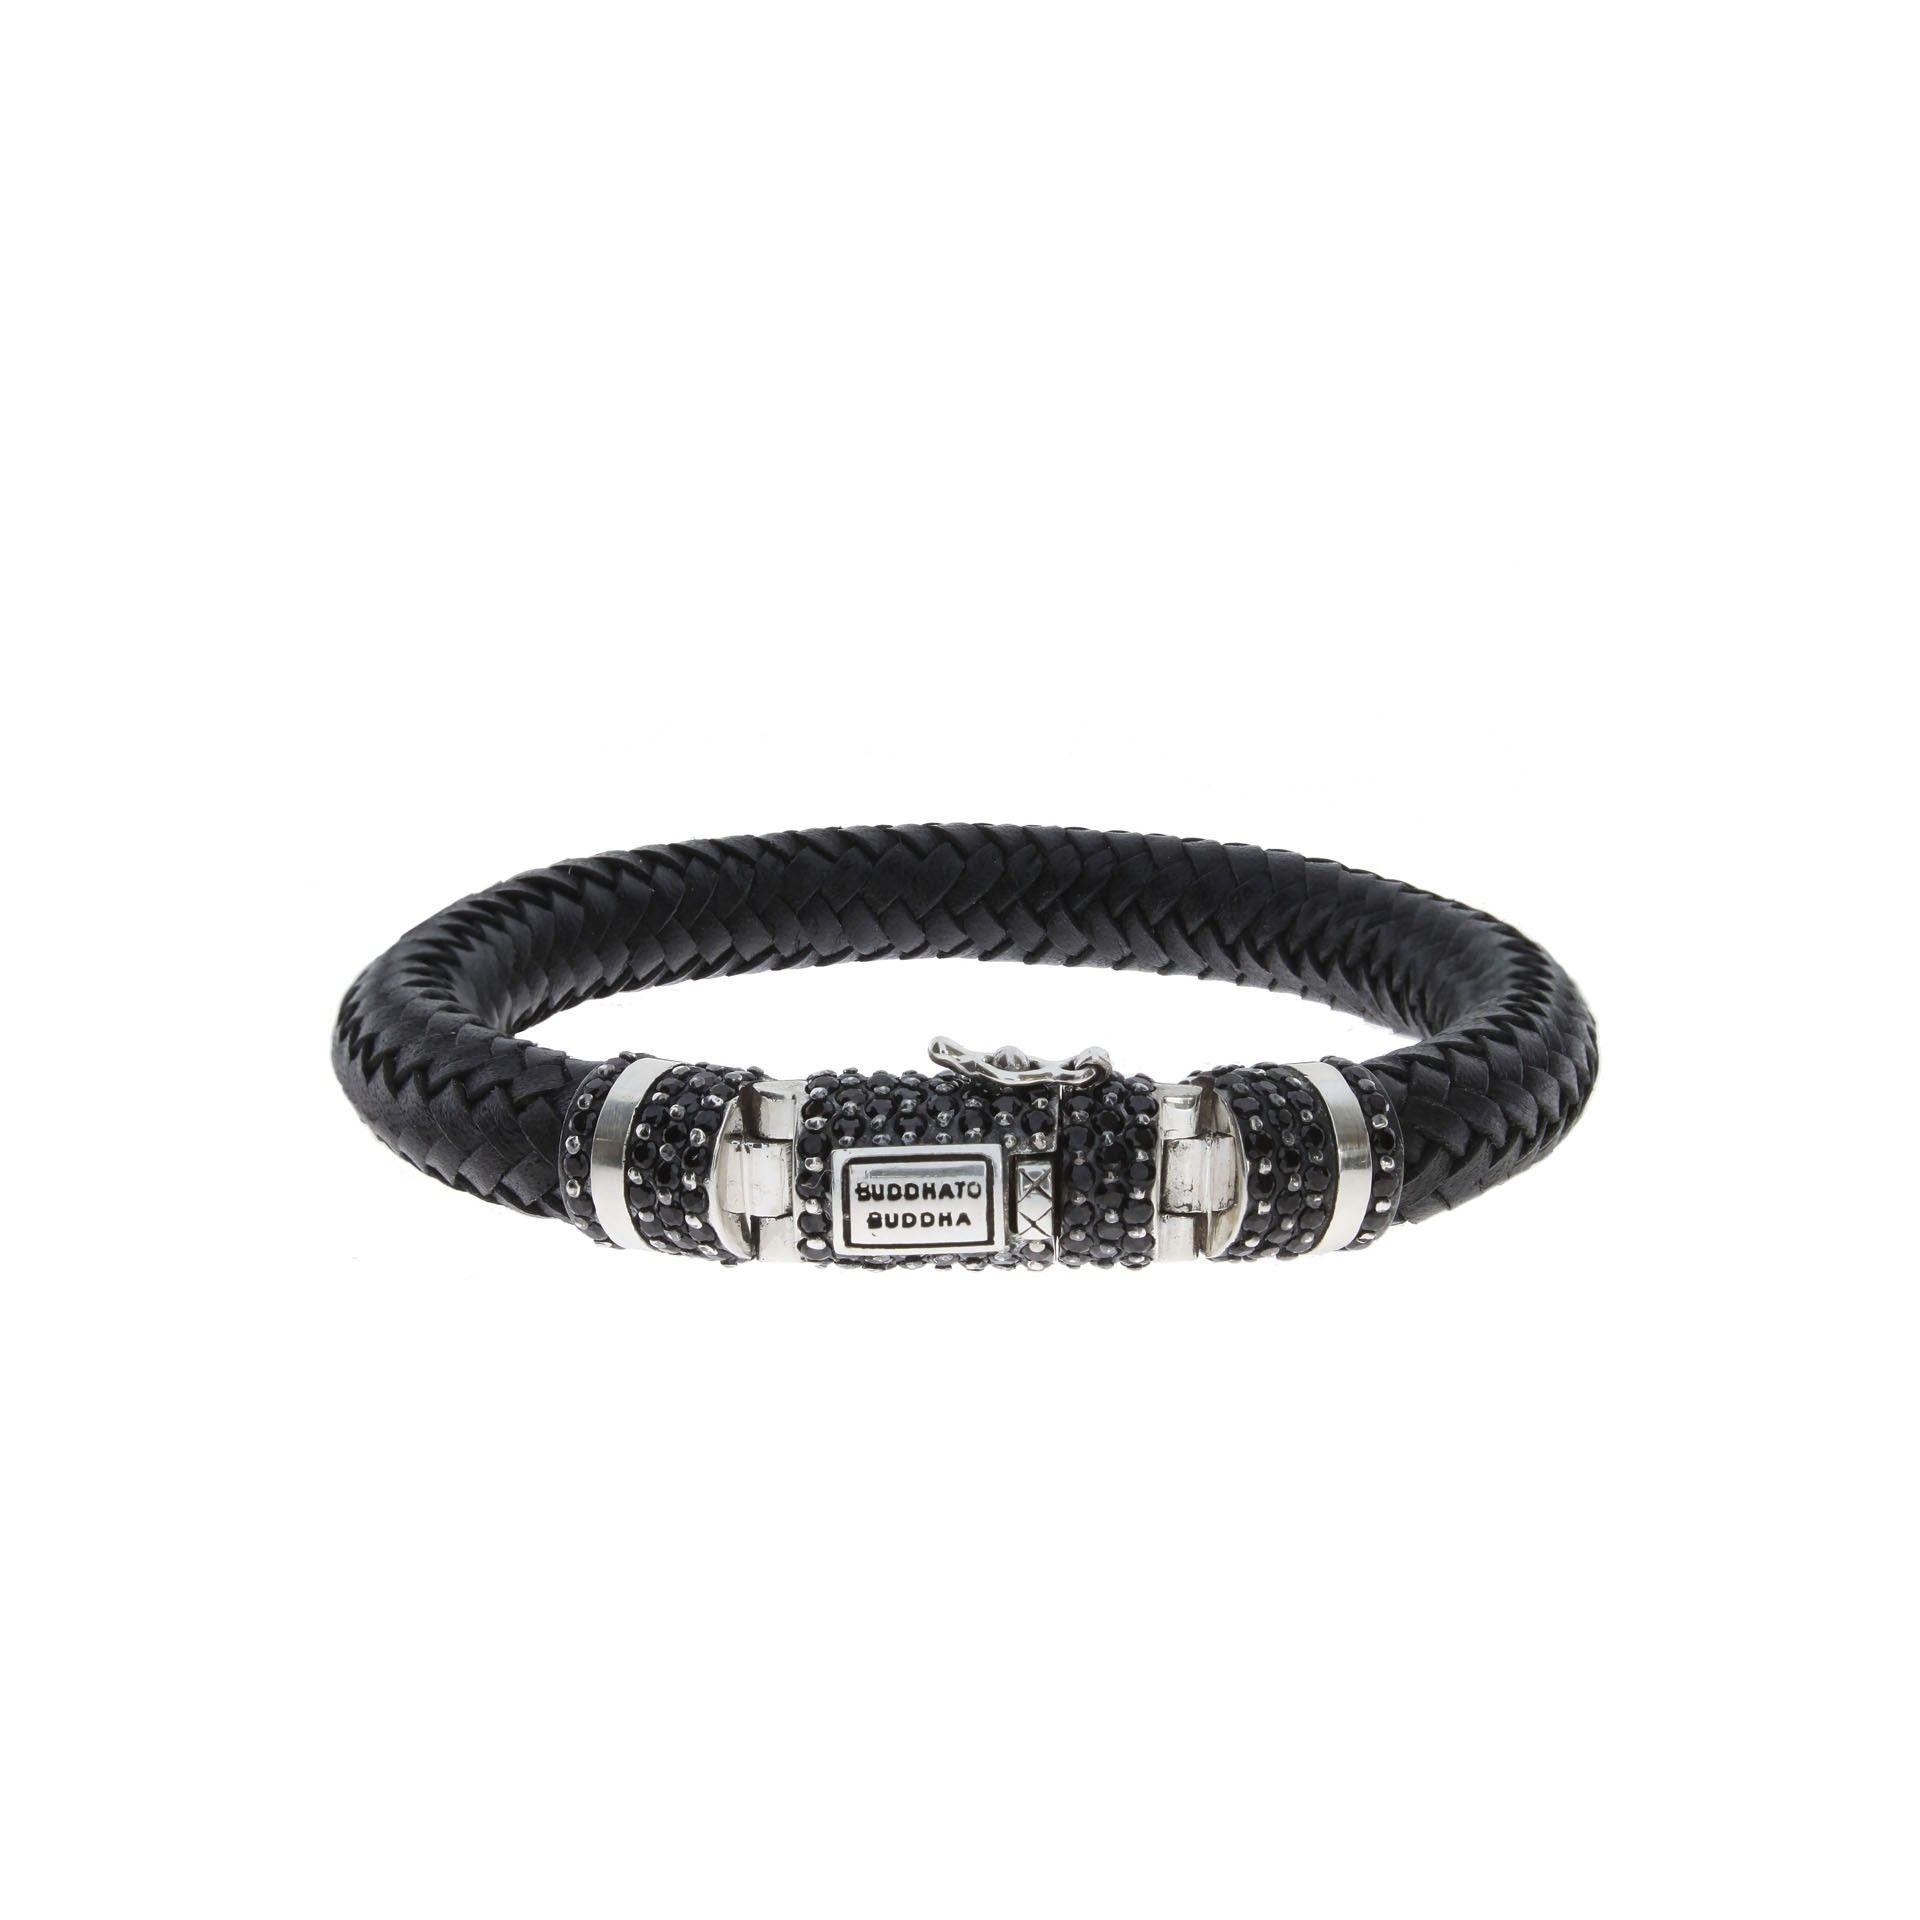 Buddha Armband Ellen.Buddha To Buddha Armband Ellen Special Moda Pinterest Armband